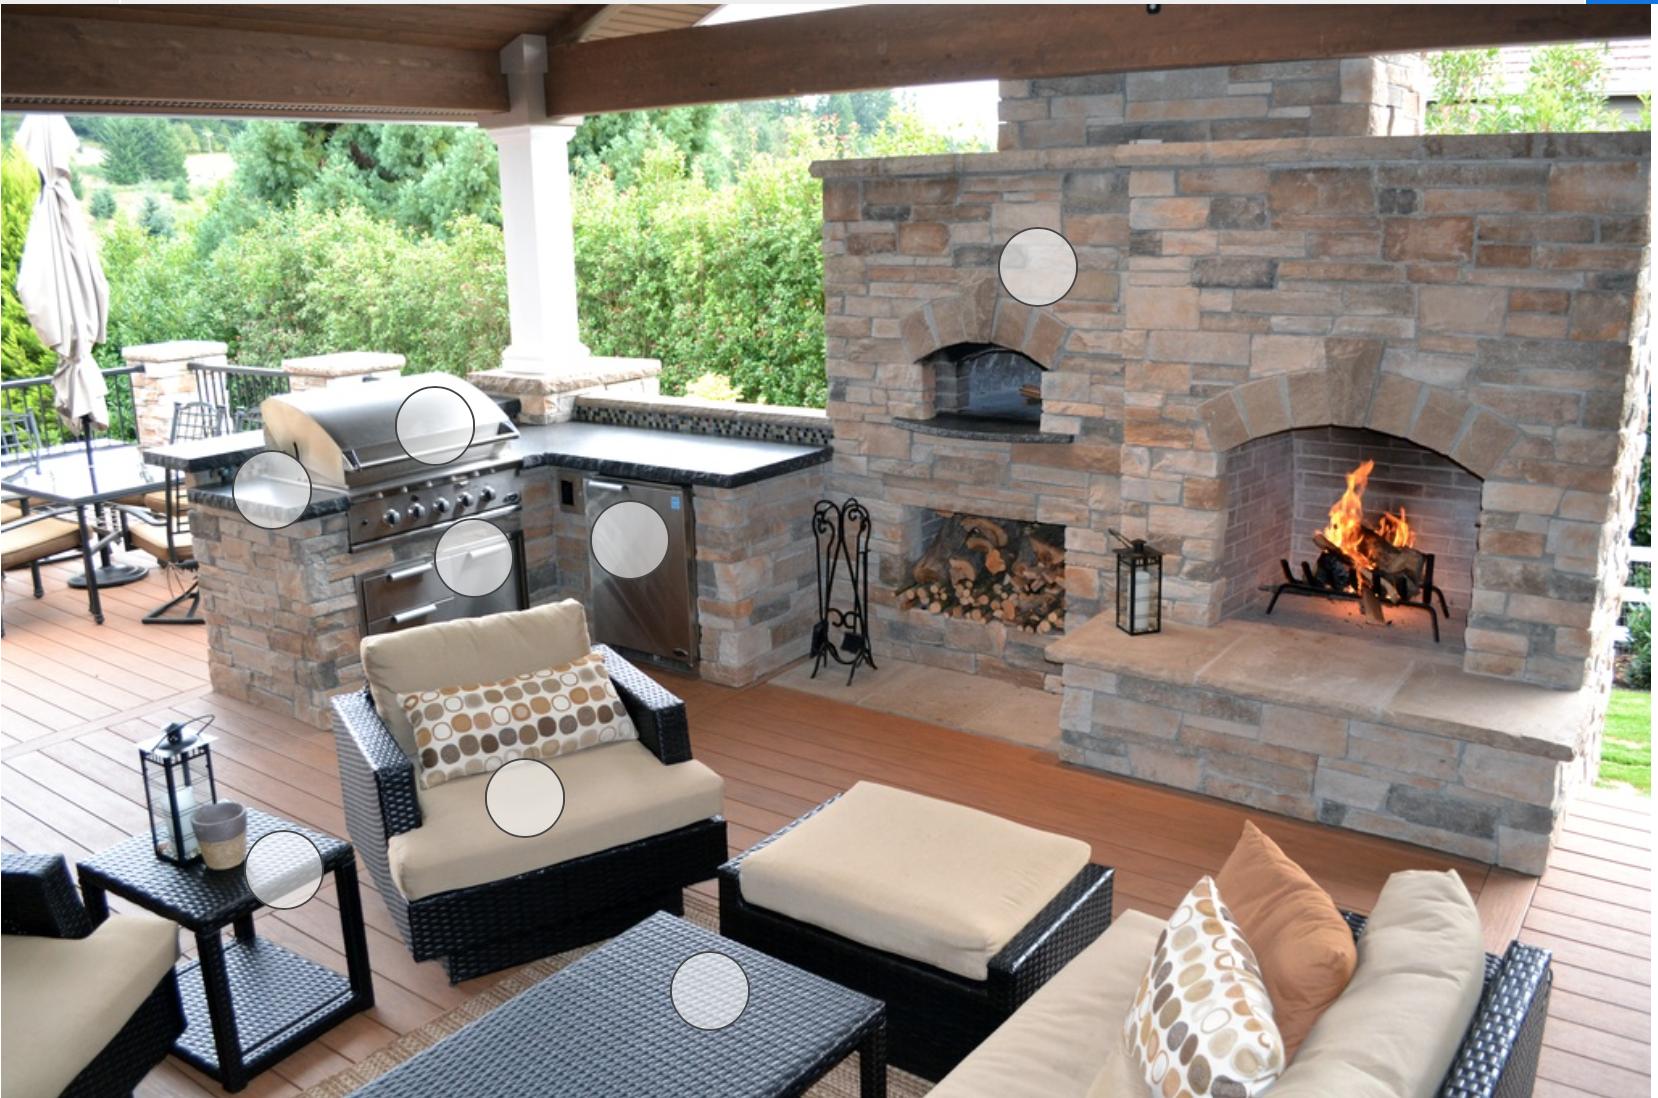 outdoor kitchen by patricia melbourne on decks and patios outdoor kitchen design outdoor on outdoor kitchen on deck id=34107